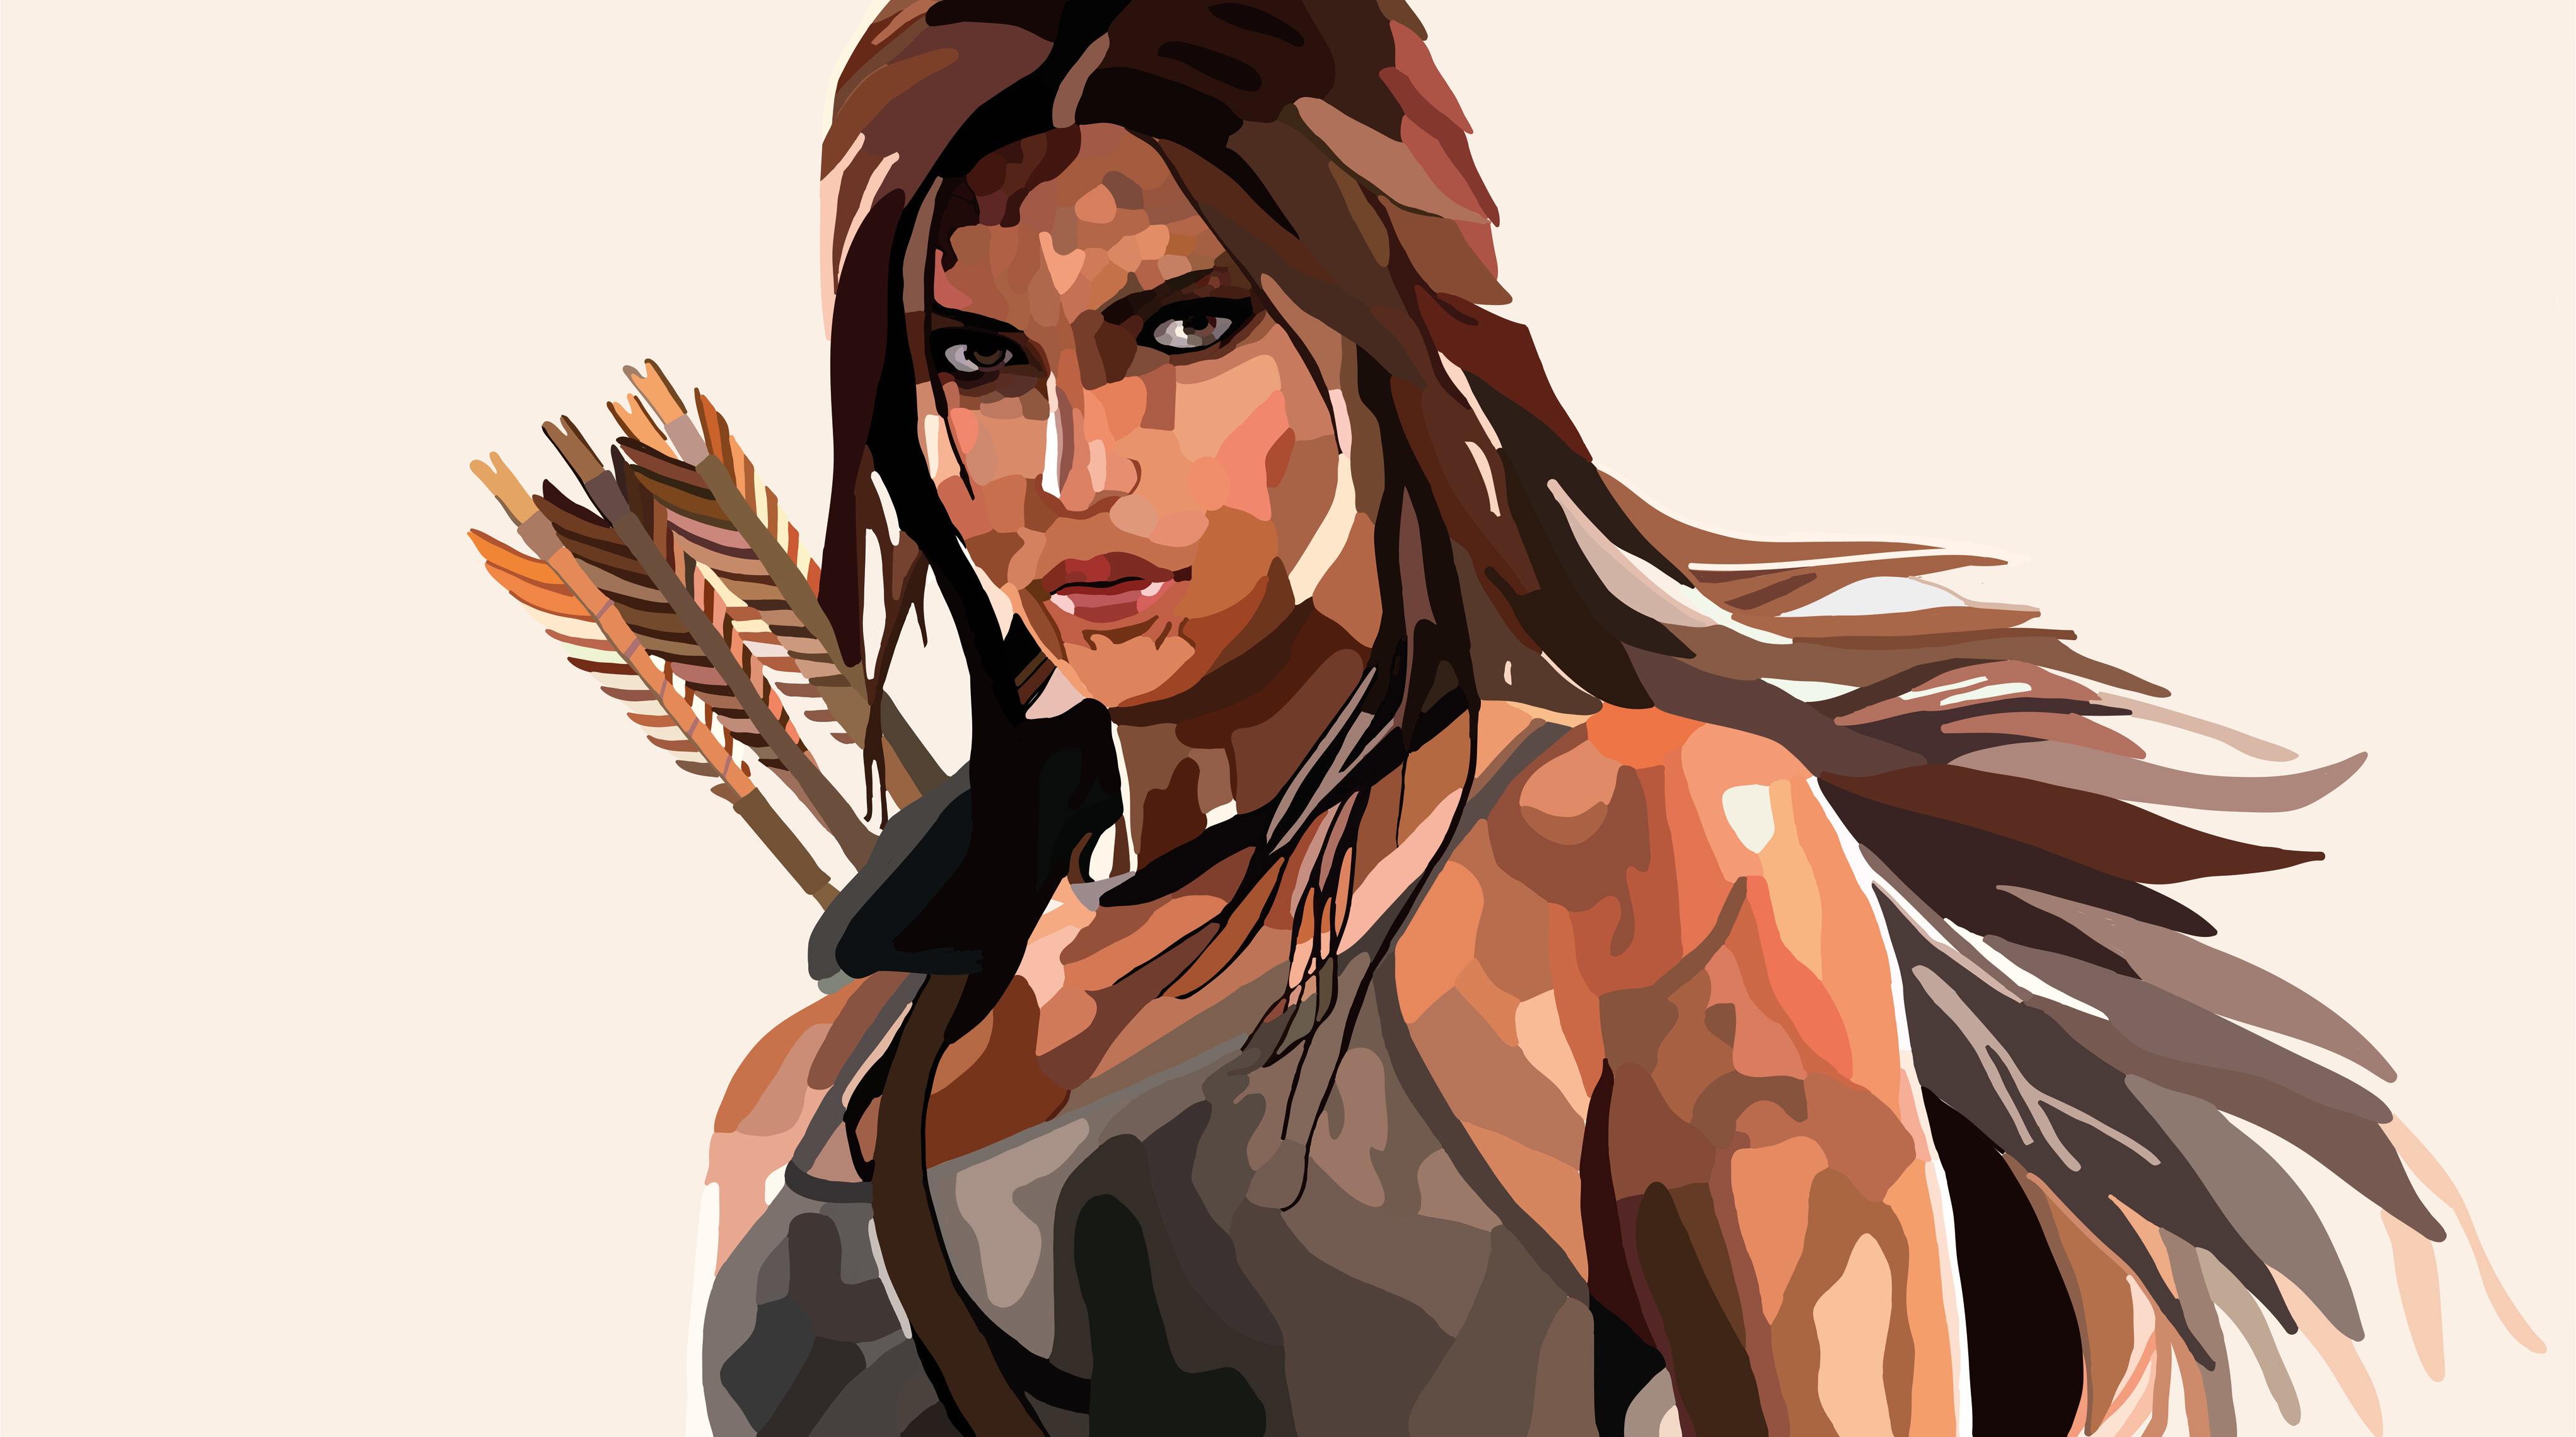 3840x2160 Lara Croft Tomb Raider Artwork 4k Hd 4k: Lara Croft Tomb Raider Vector Art 4k, HD Games, 4k